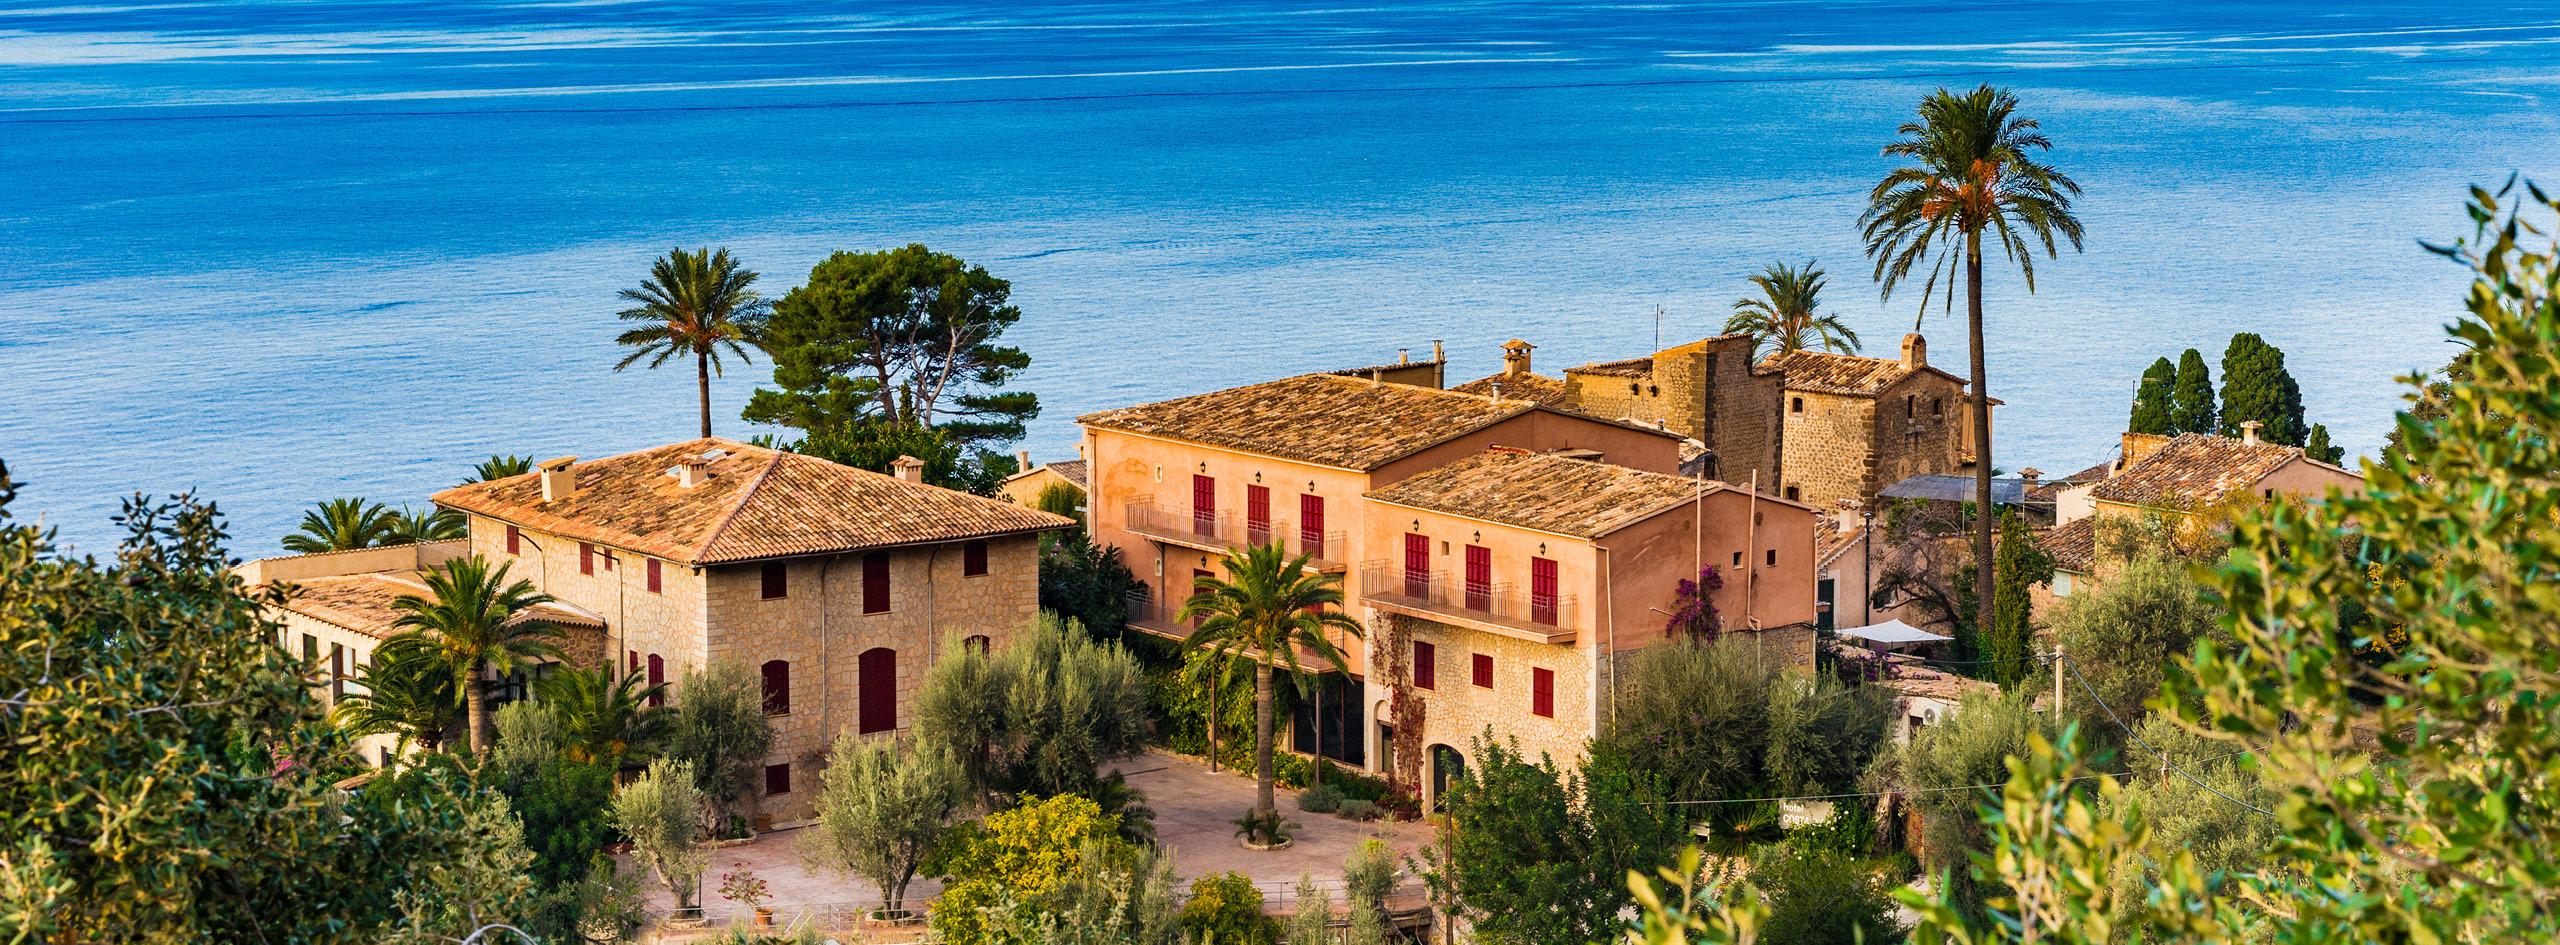 CONTELLE Trainingsangebote Mallorca